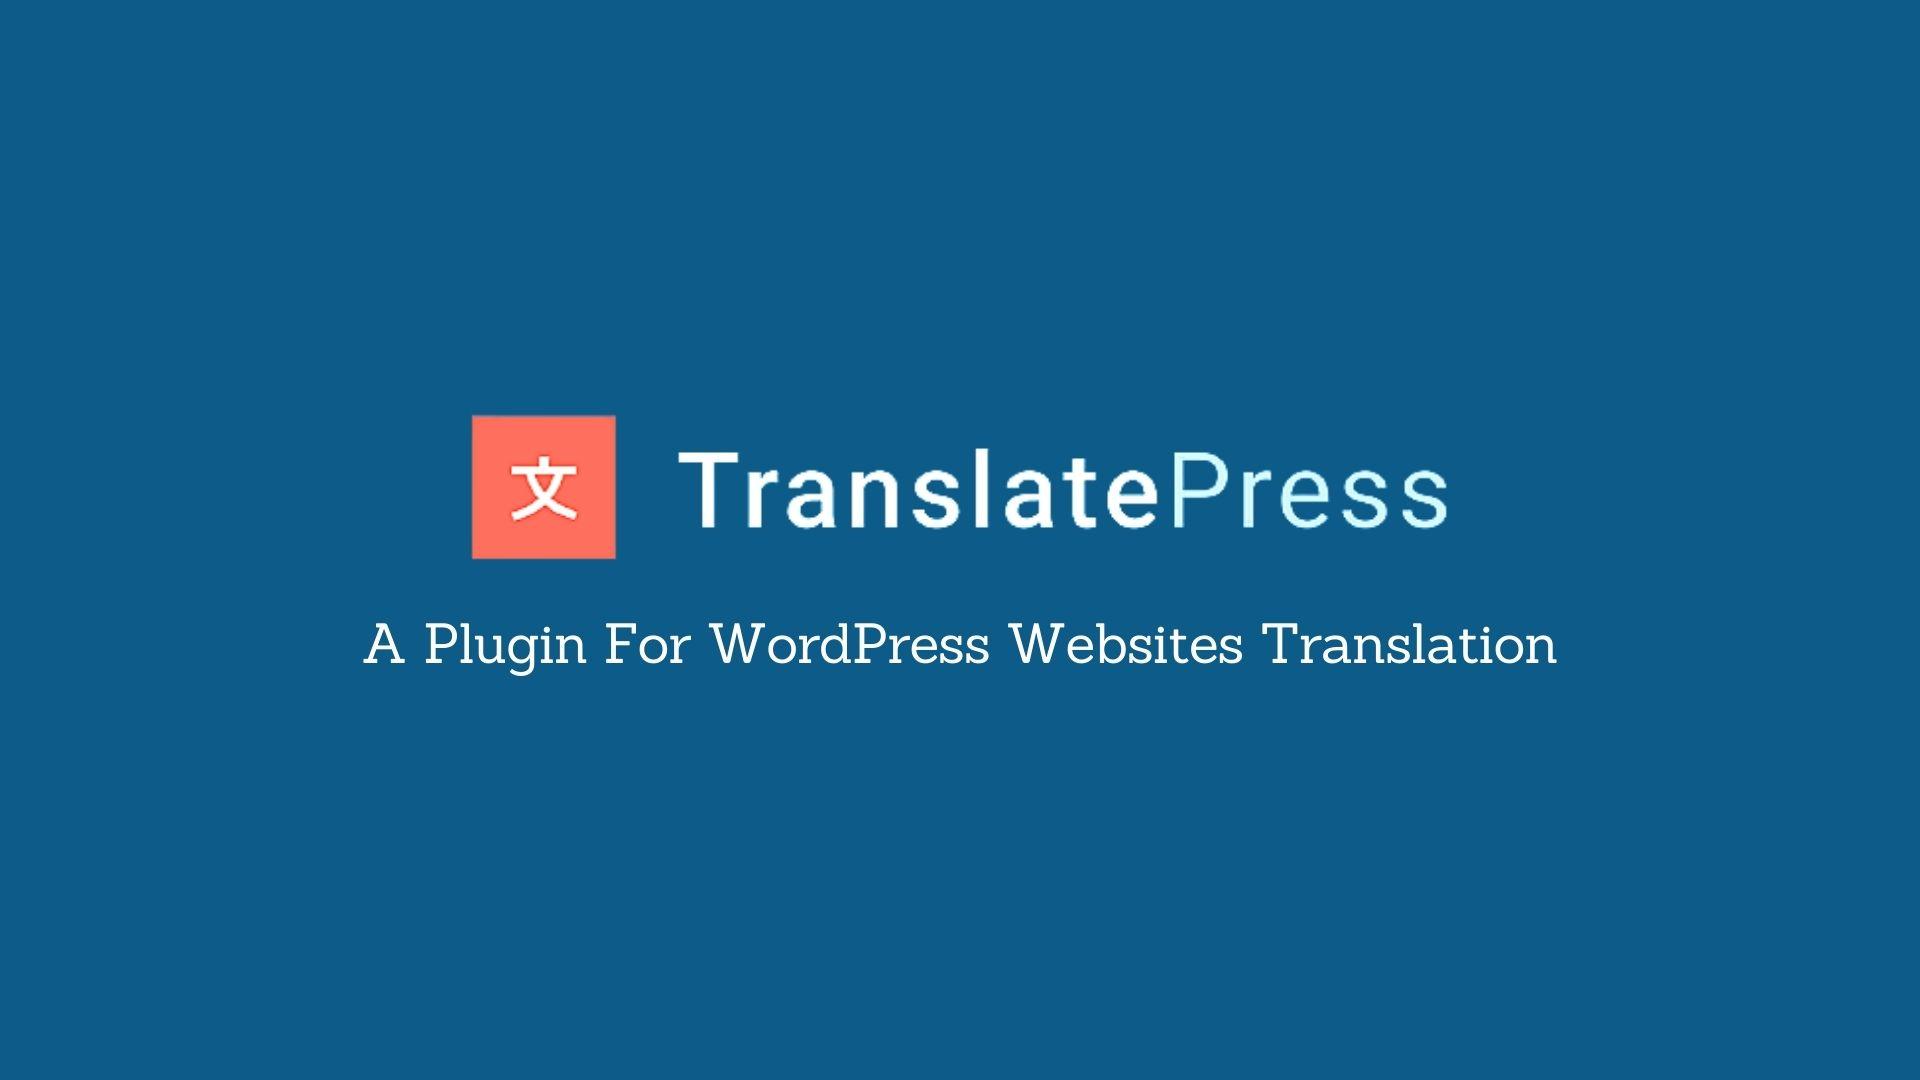 What Is TranslatePress?